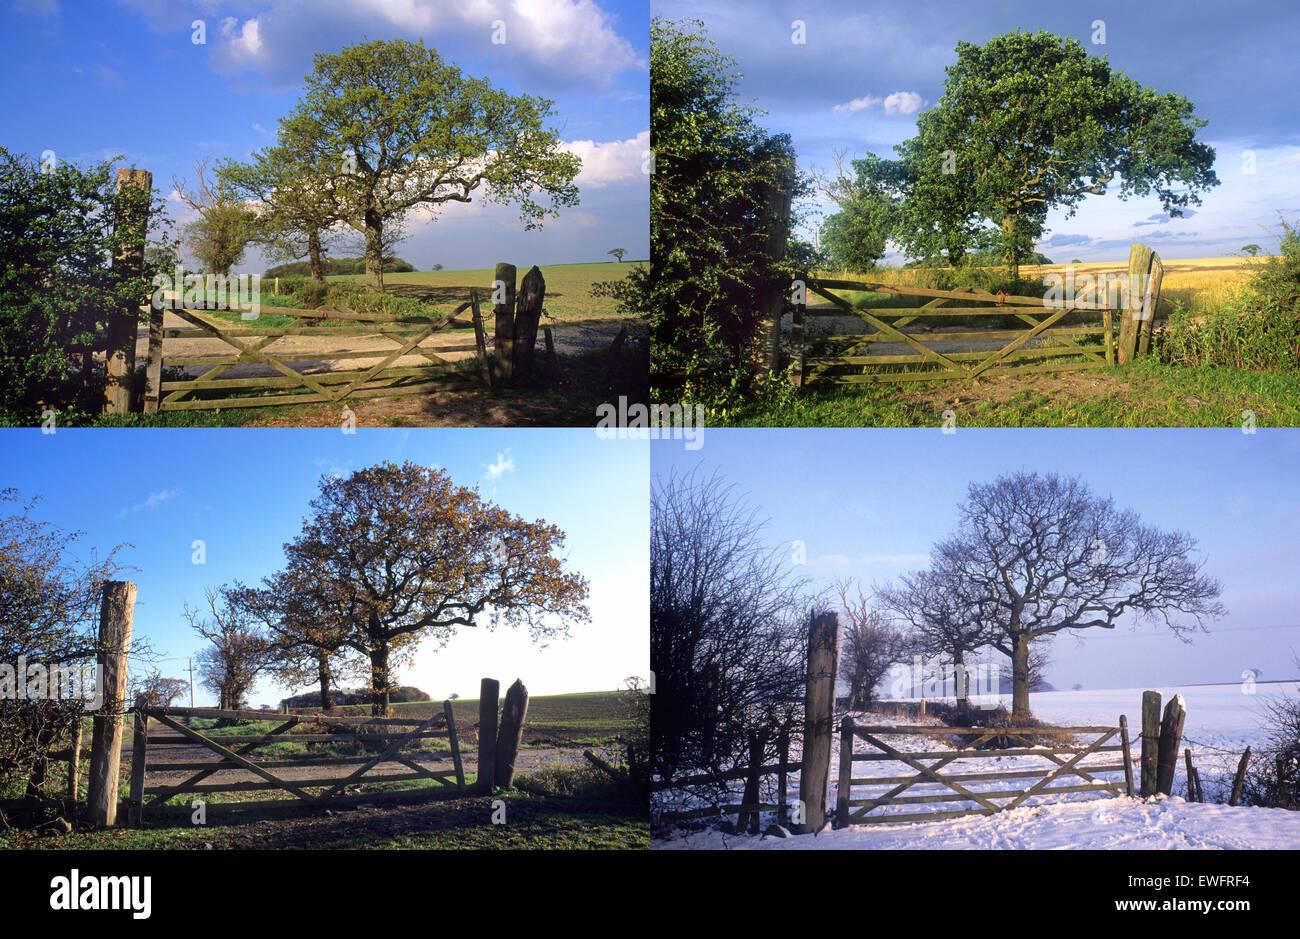 Four Seasons Taken In The Same Location Through Spring